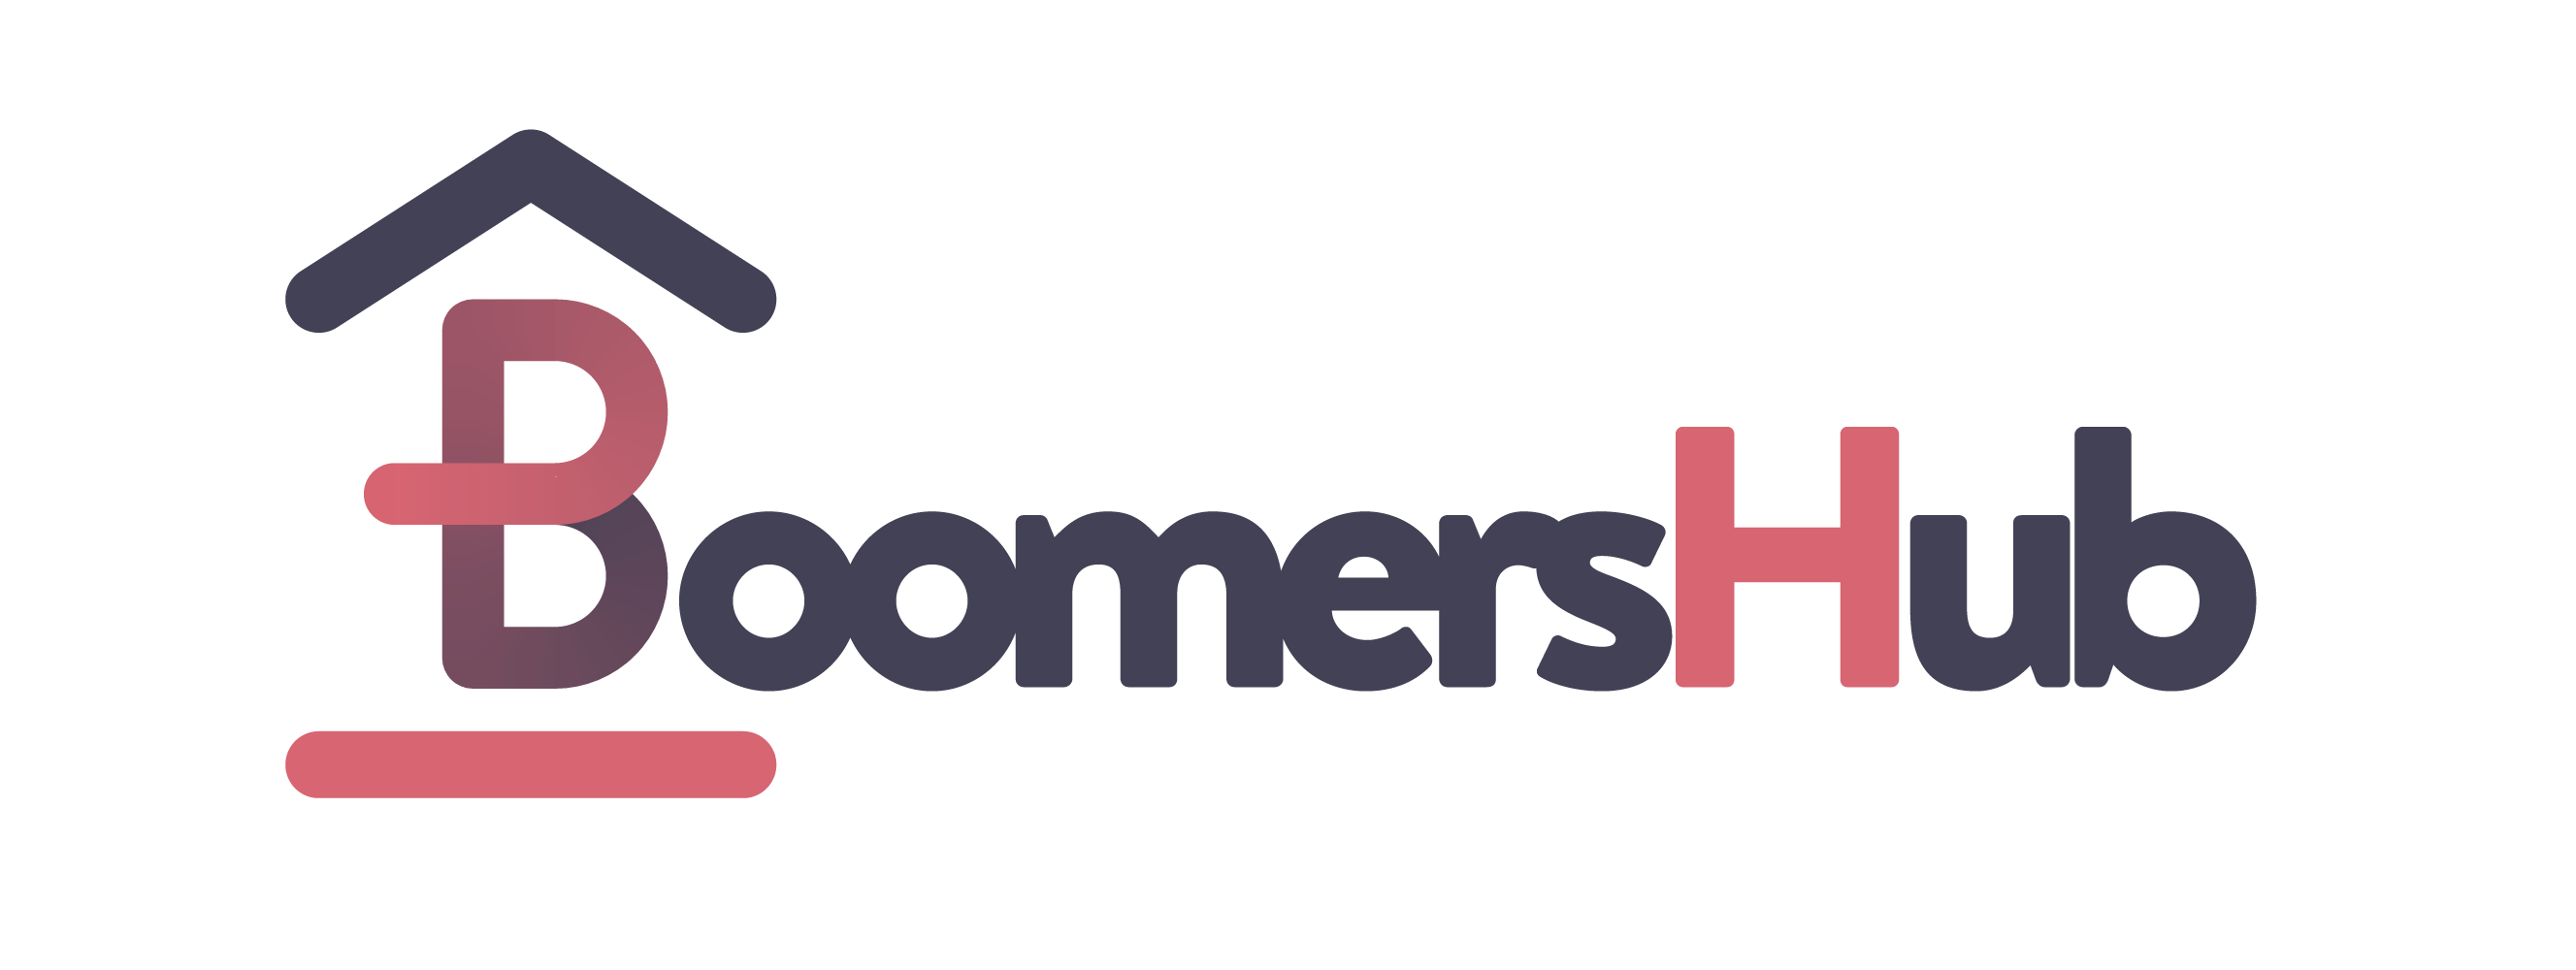 BoomersHub Blog